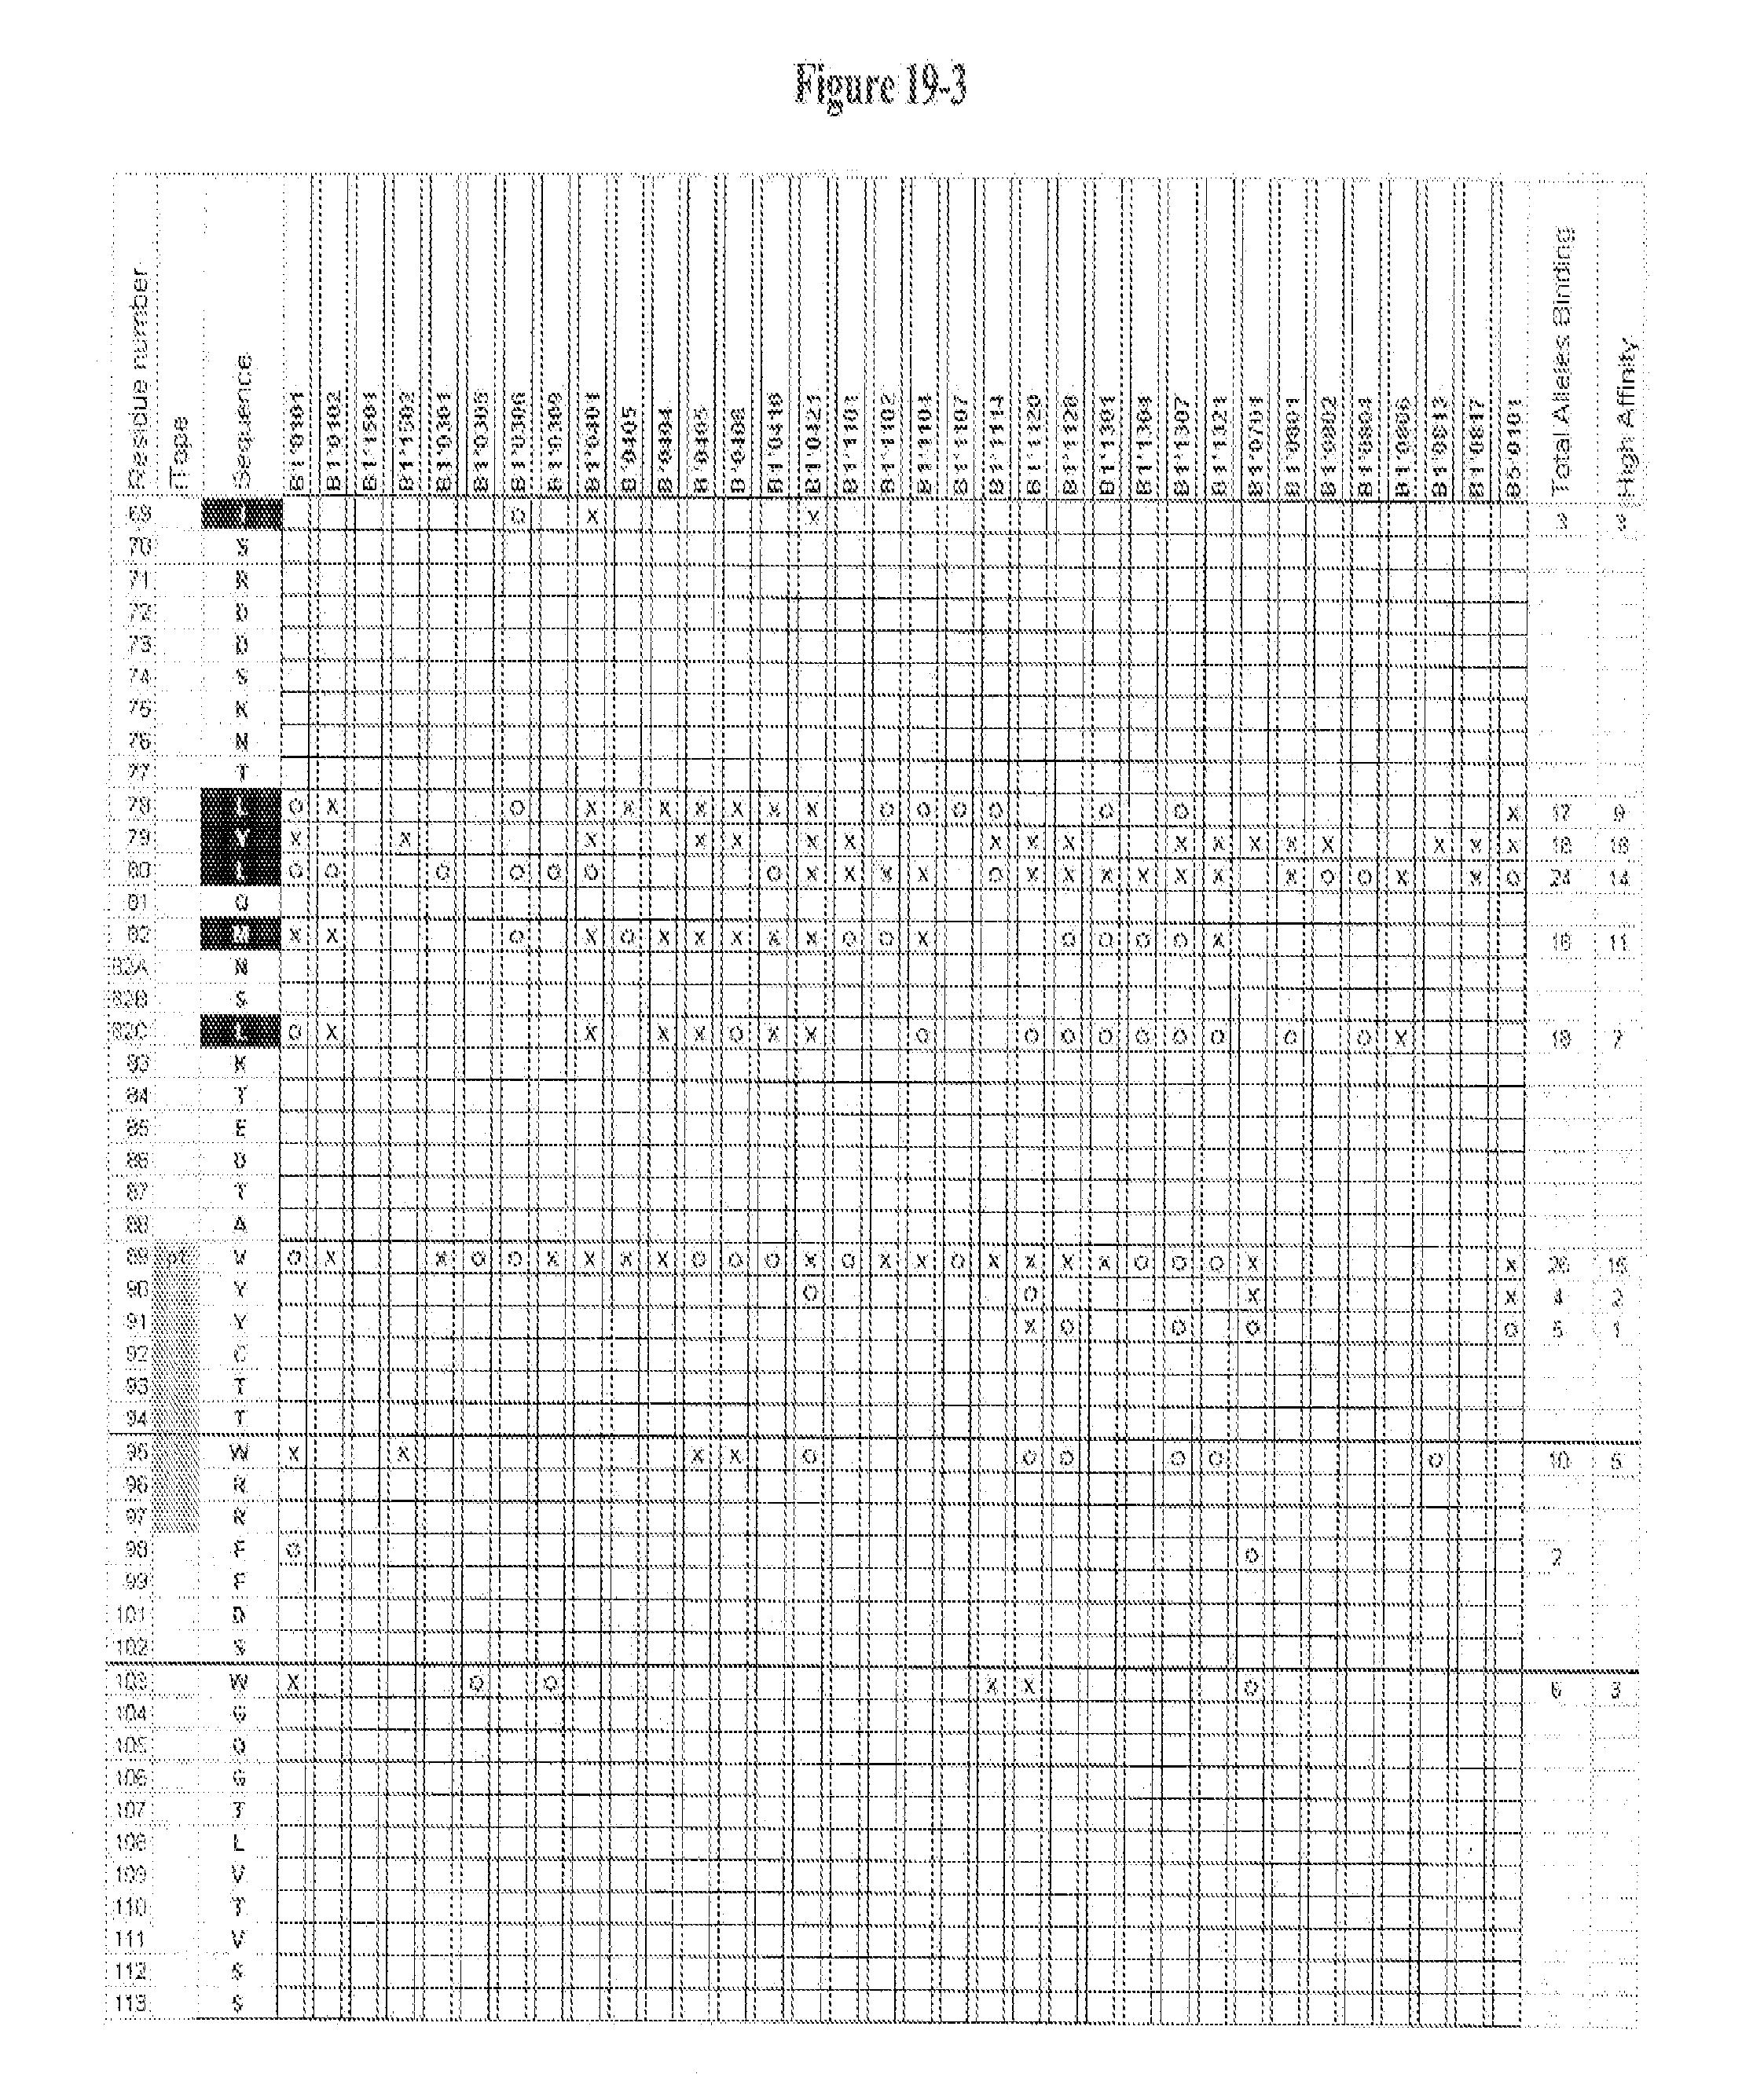 схема стабилизатора ссн 250